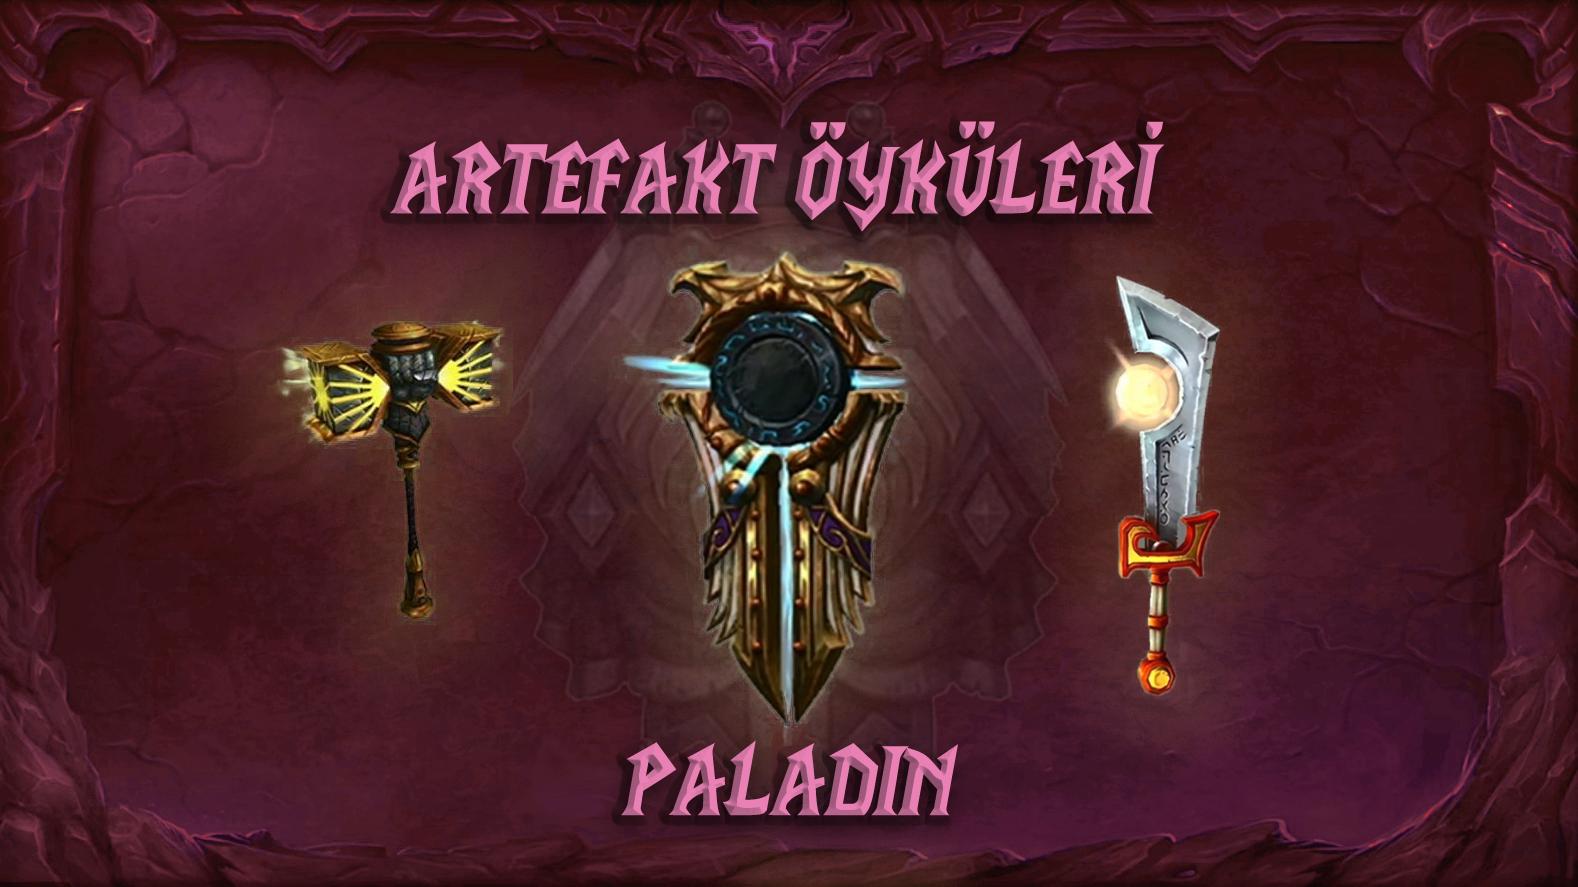 lorekeeper-artefakt-oykuleri-paladin